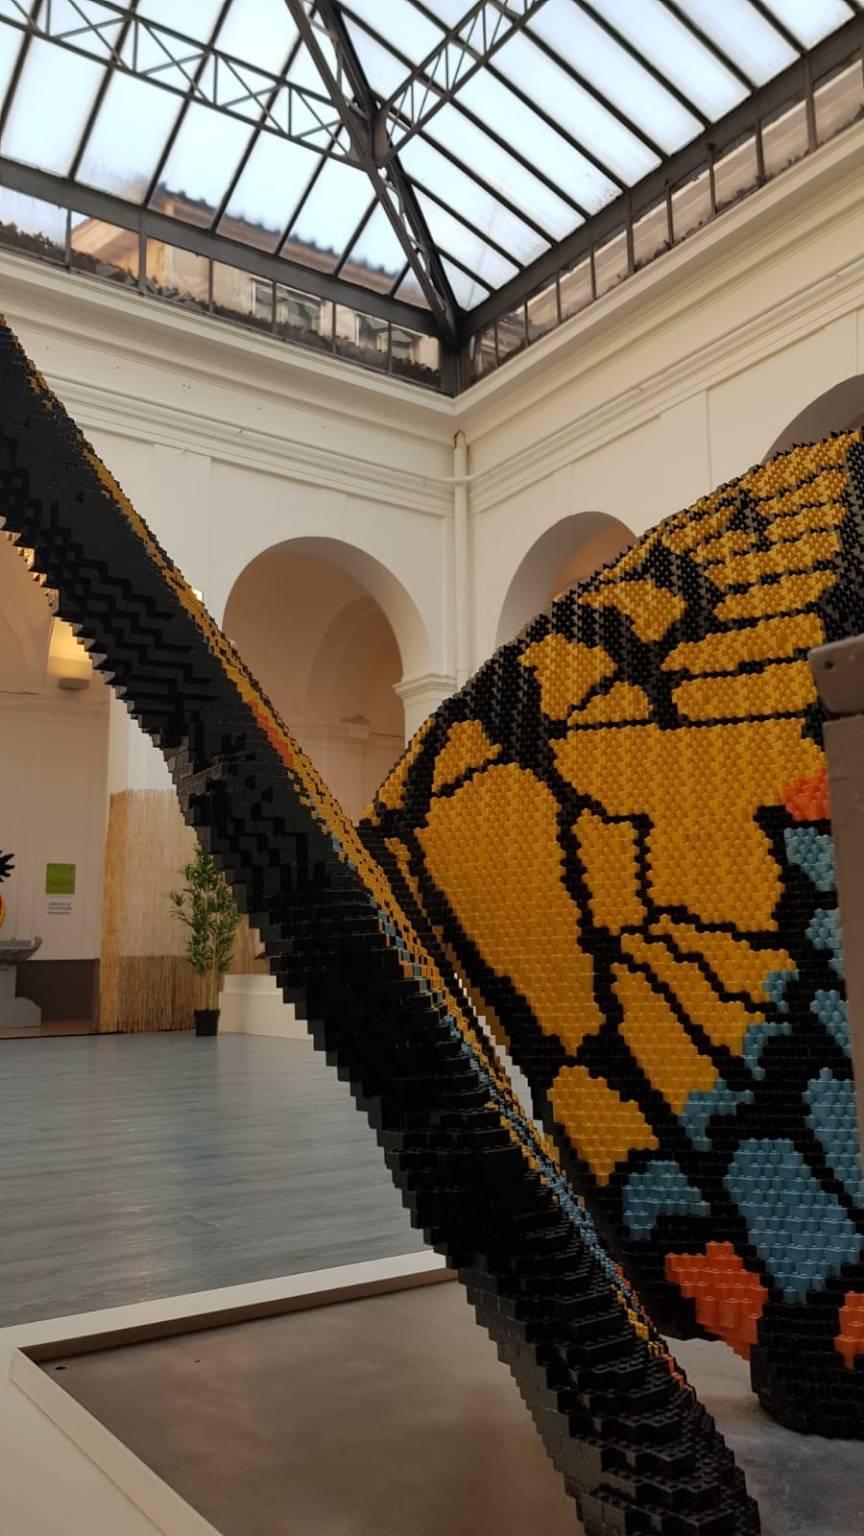 NATURE WITH LEGO® BRICKS